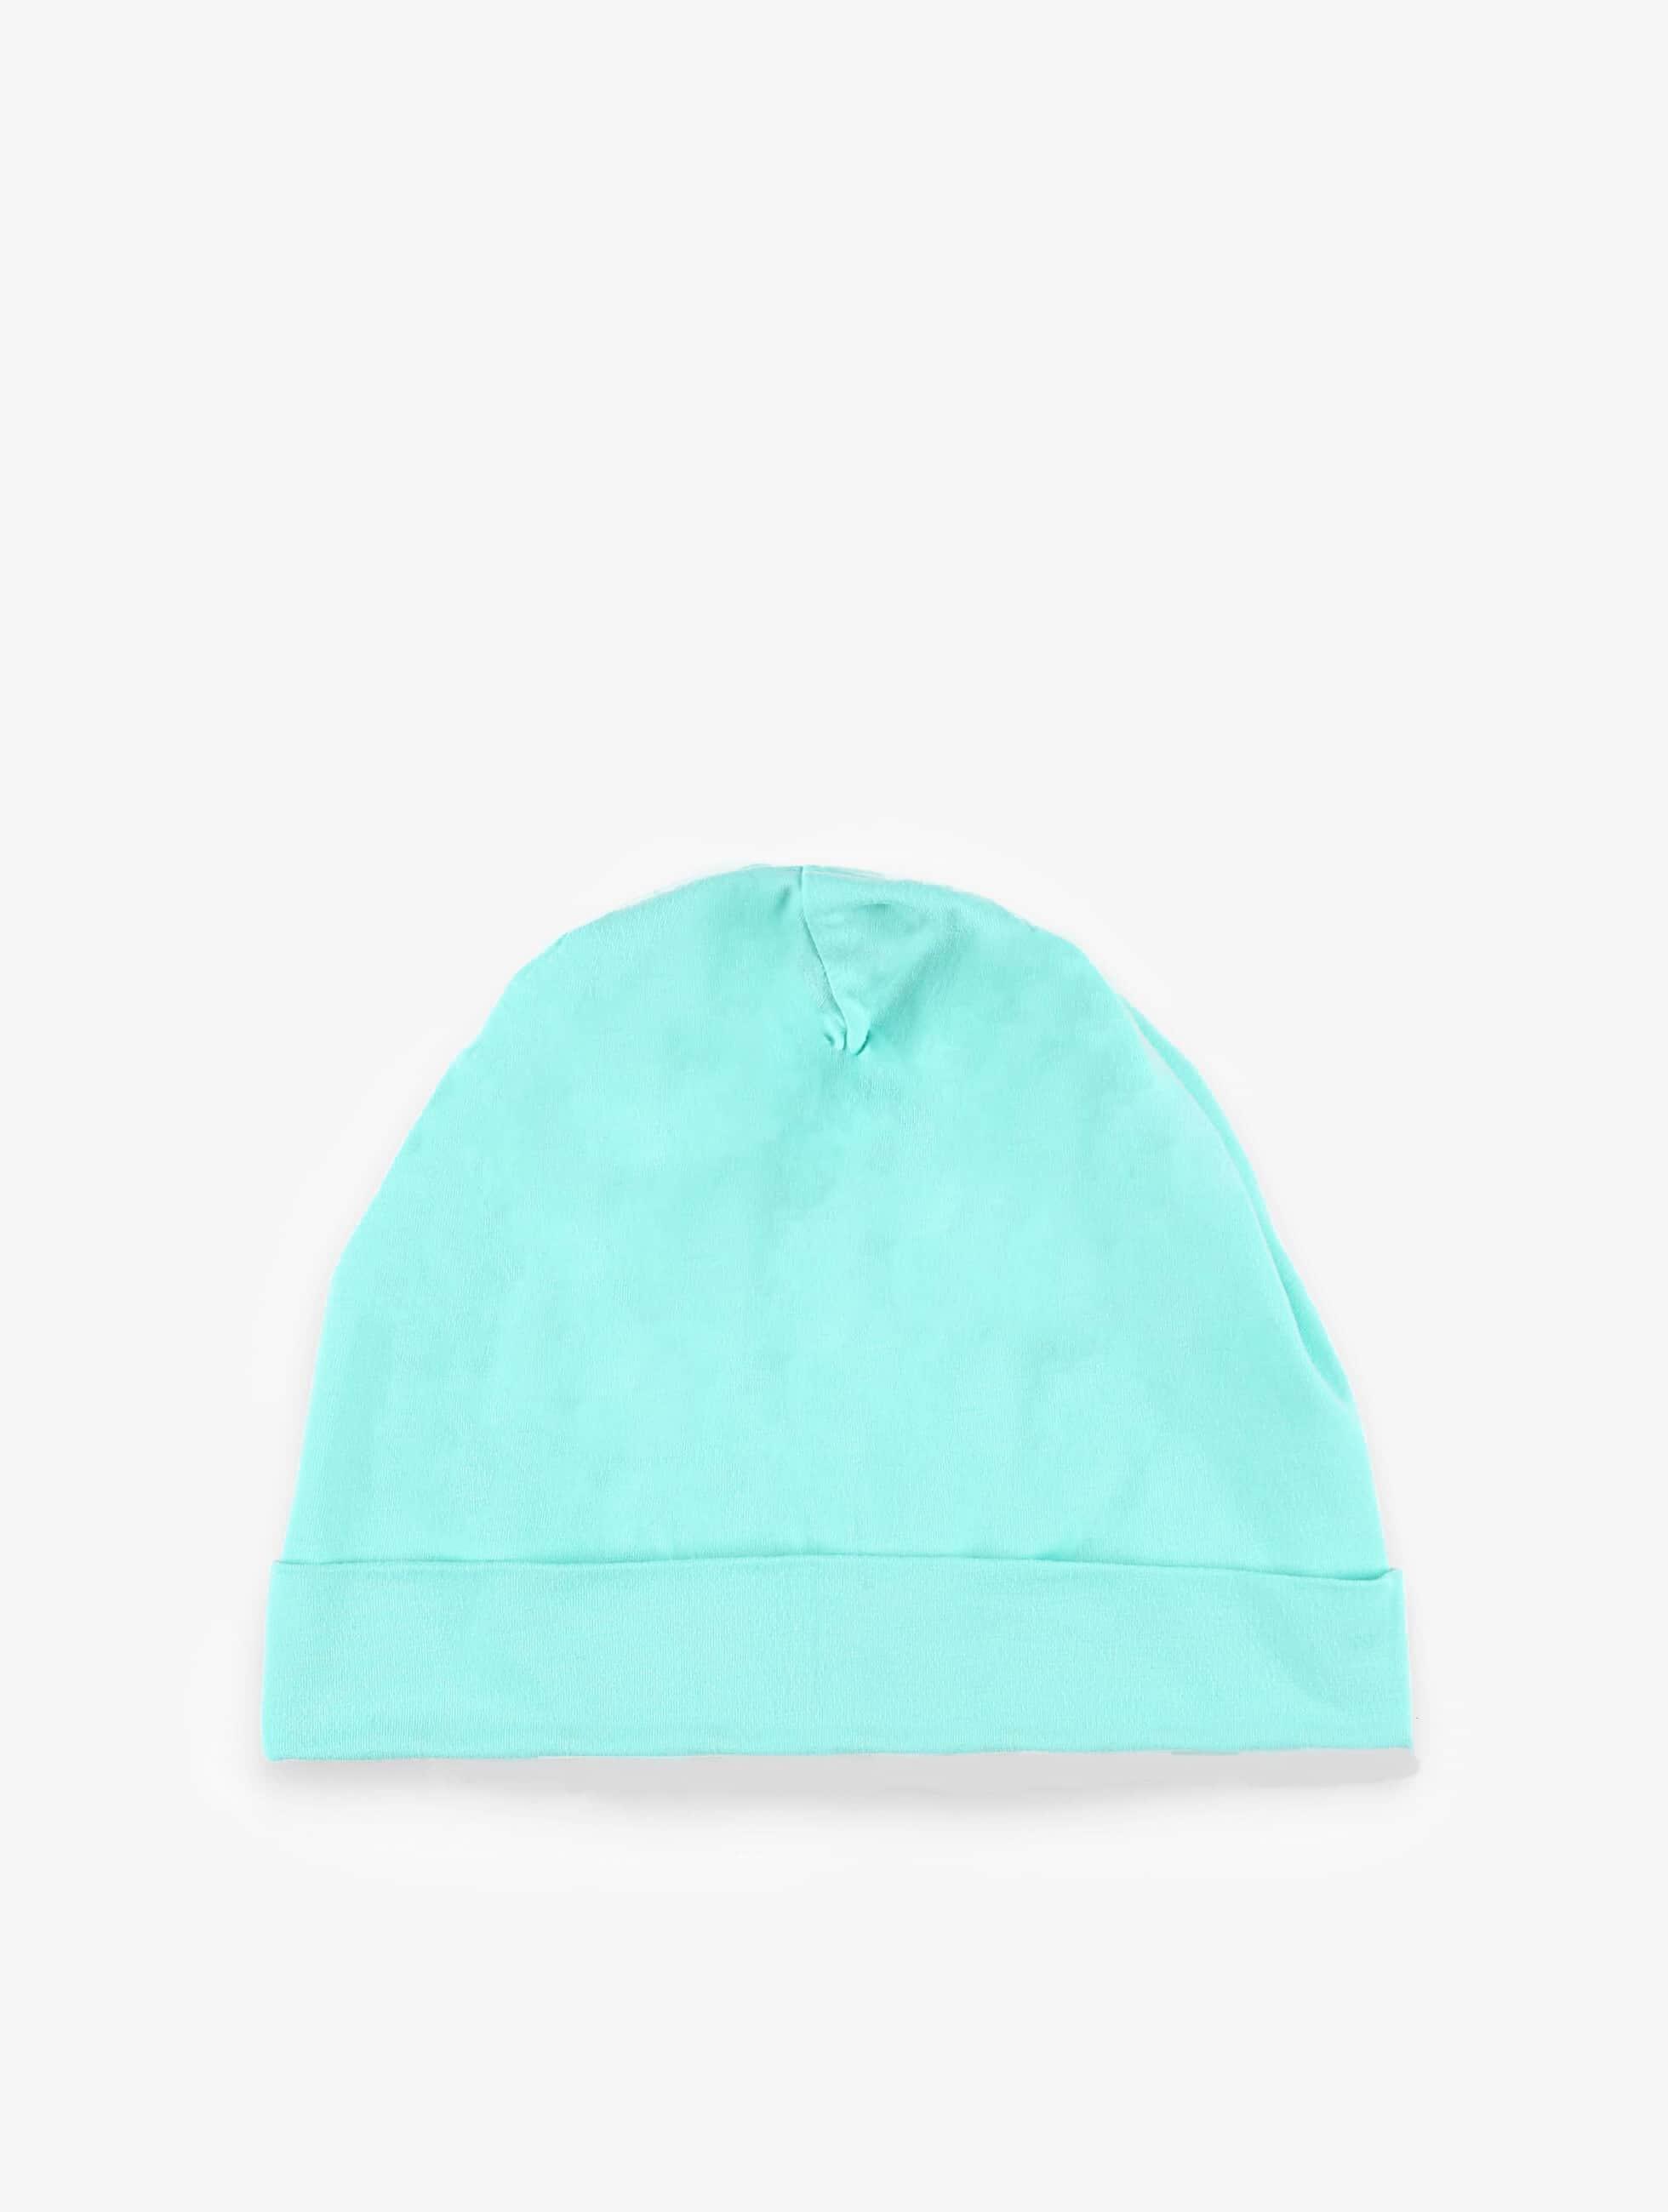 MSTRDS Bonnet Pastel Jersey turquoise